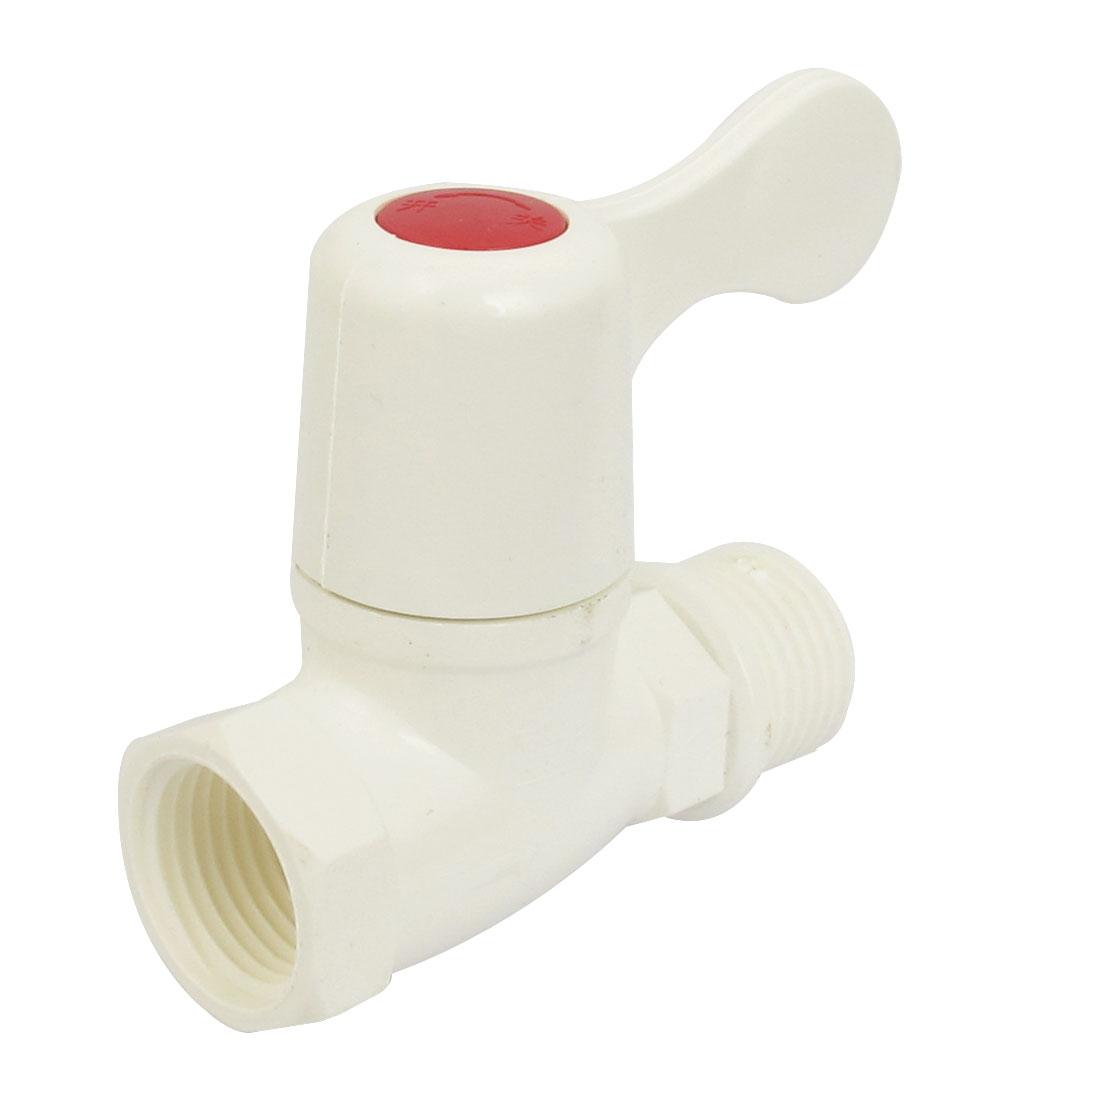 White Plastic Straight Water Heater Valve Control Tap 20mm Thread Dia